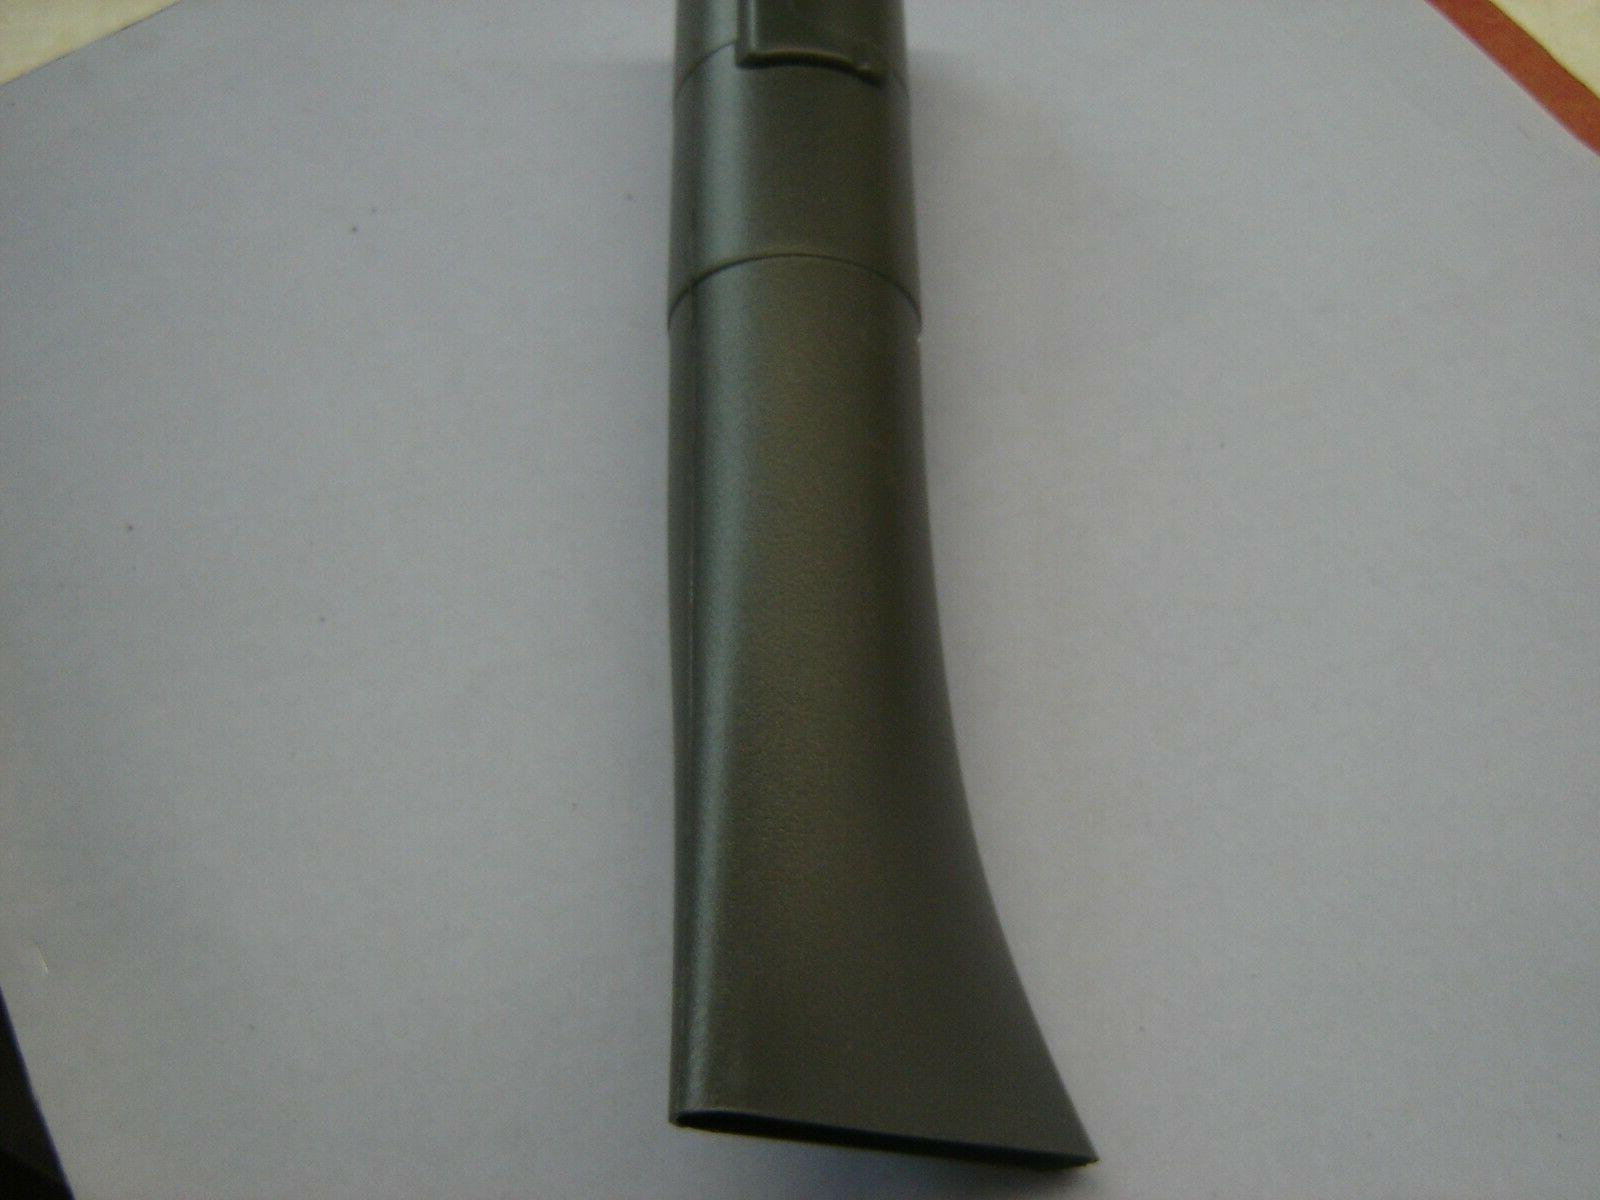 Husqvarna 125B Leaf Blower Flare Nozzle & 2 POULAN 3.2 oz En